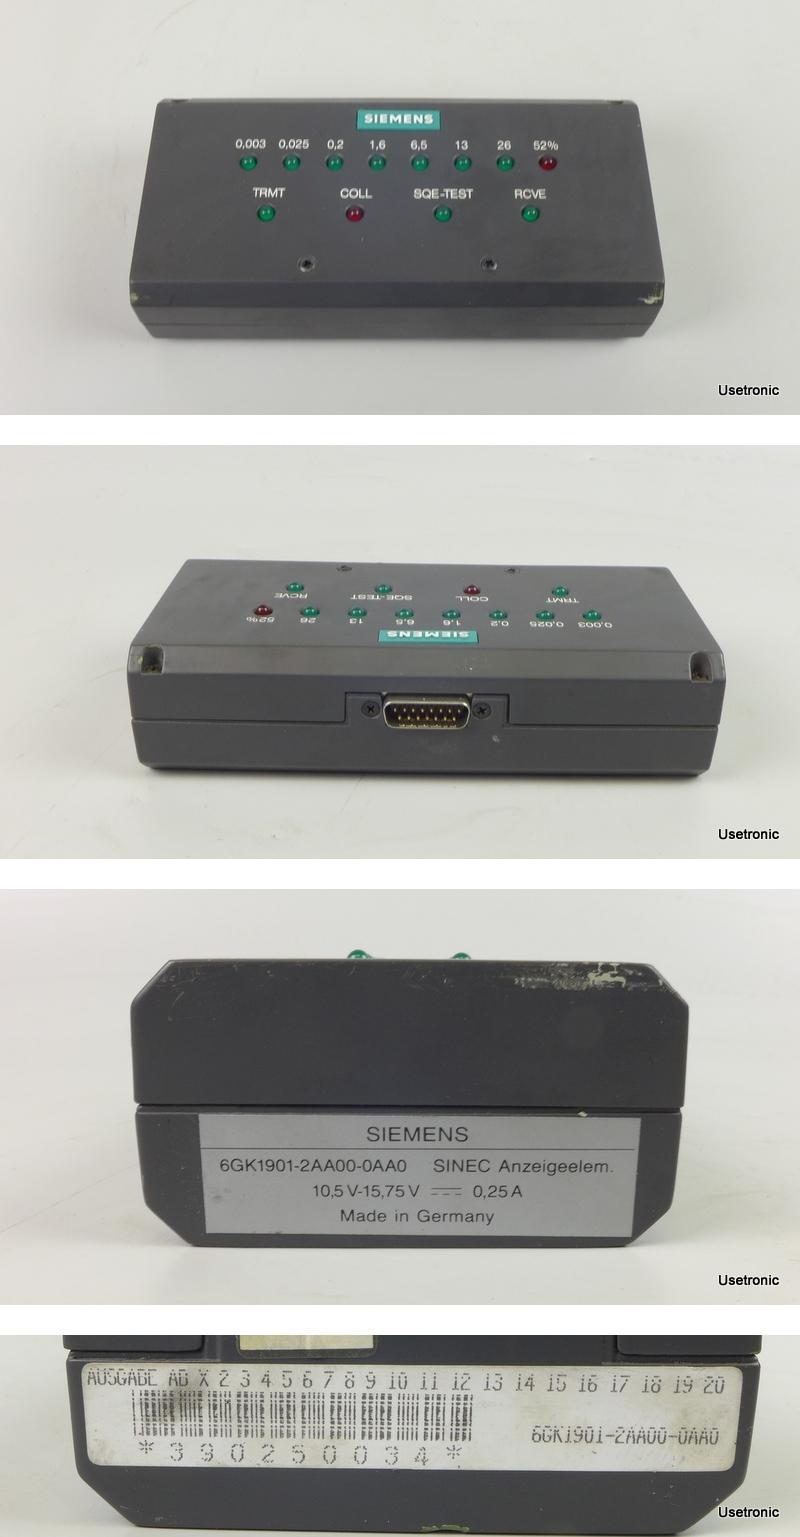 Siemens 6GK1901-2AA00-0AA0